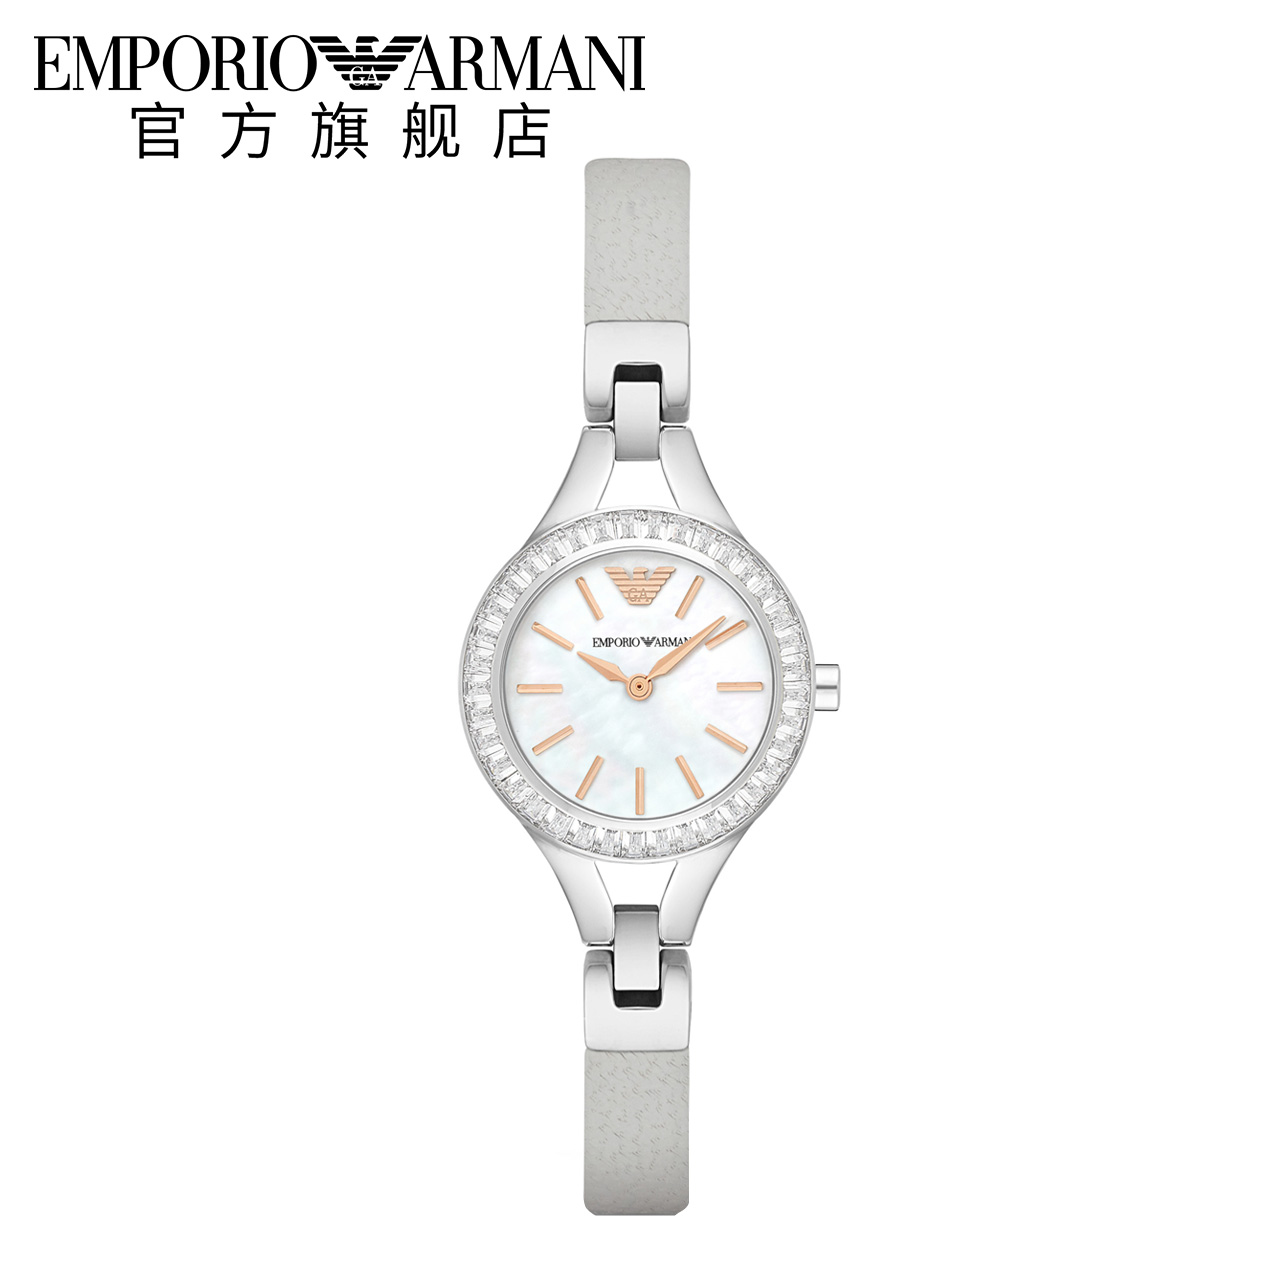 Armani阿玛尼满天星轻薄小表盘镶钻女士手表 简约石英女表AR7426